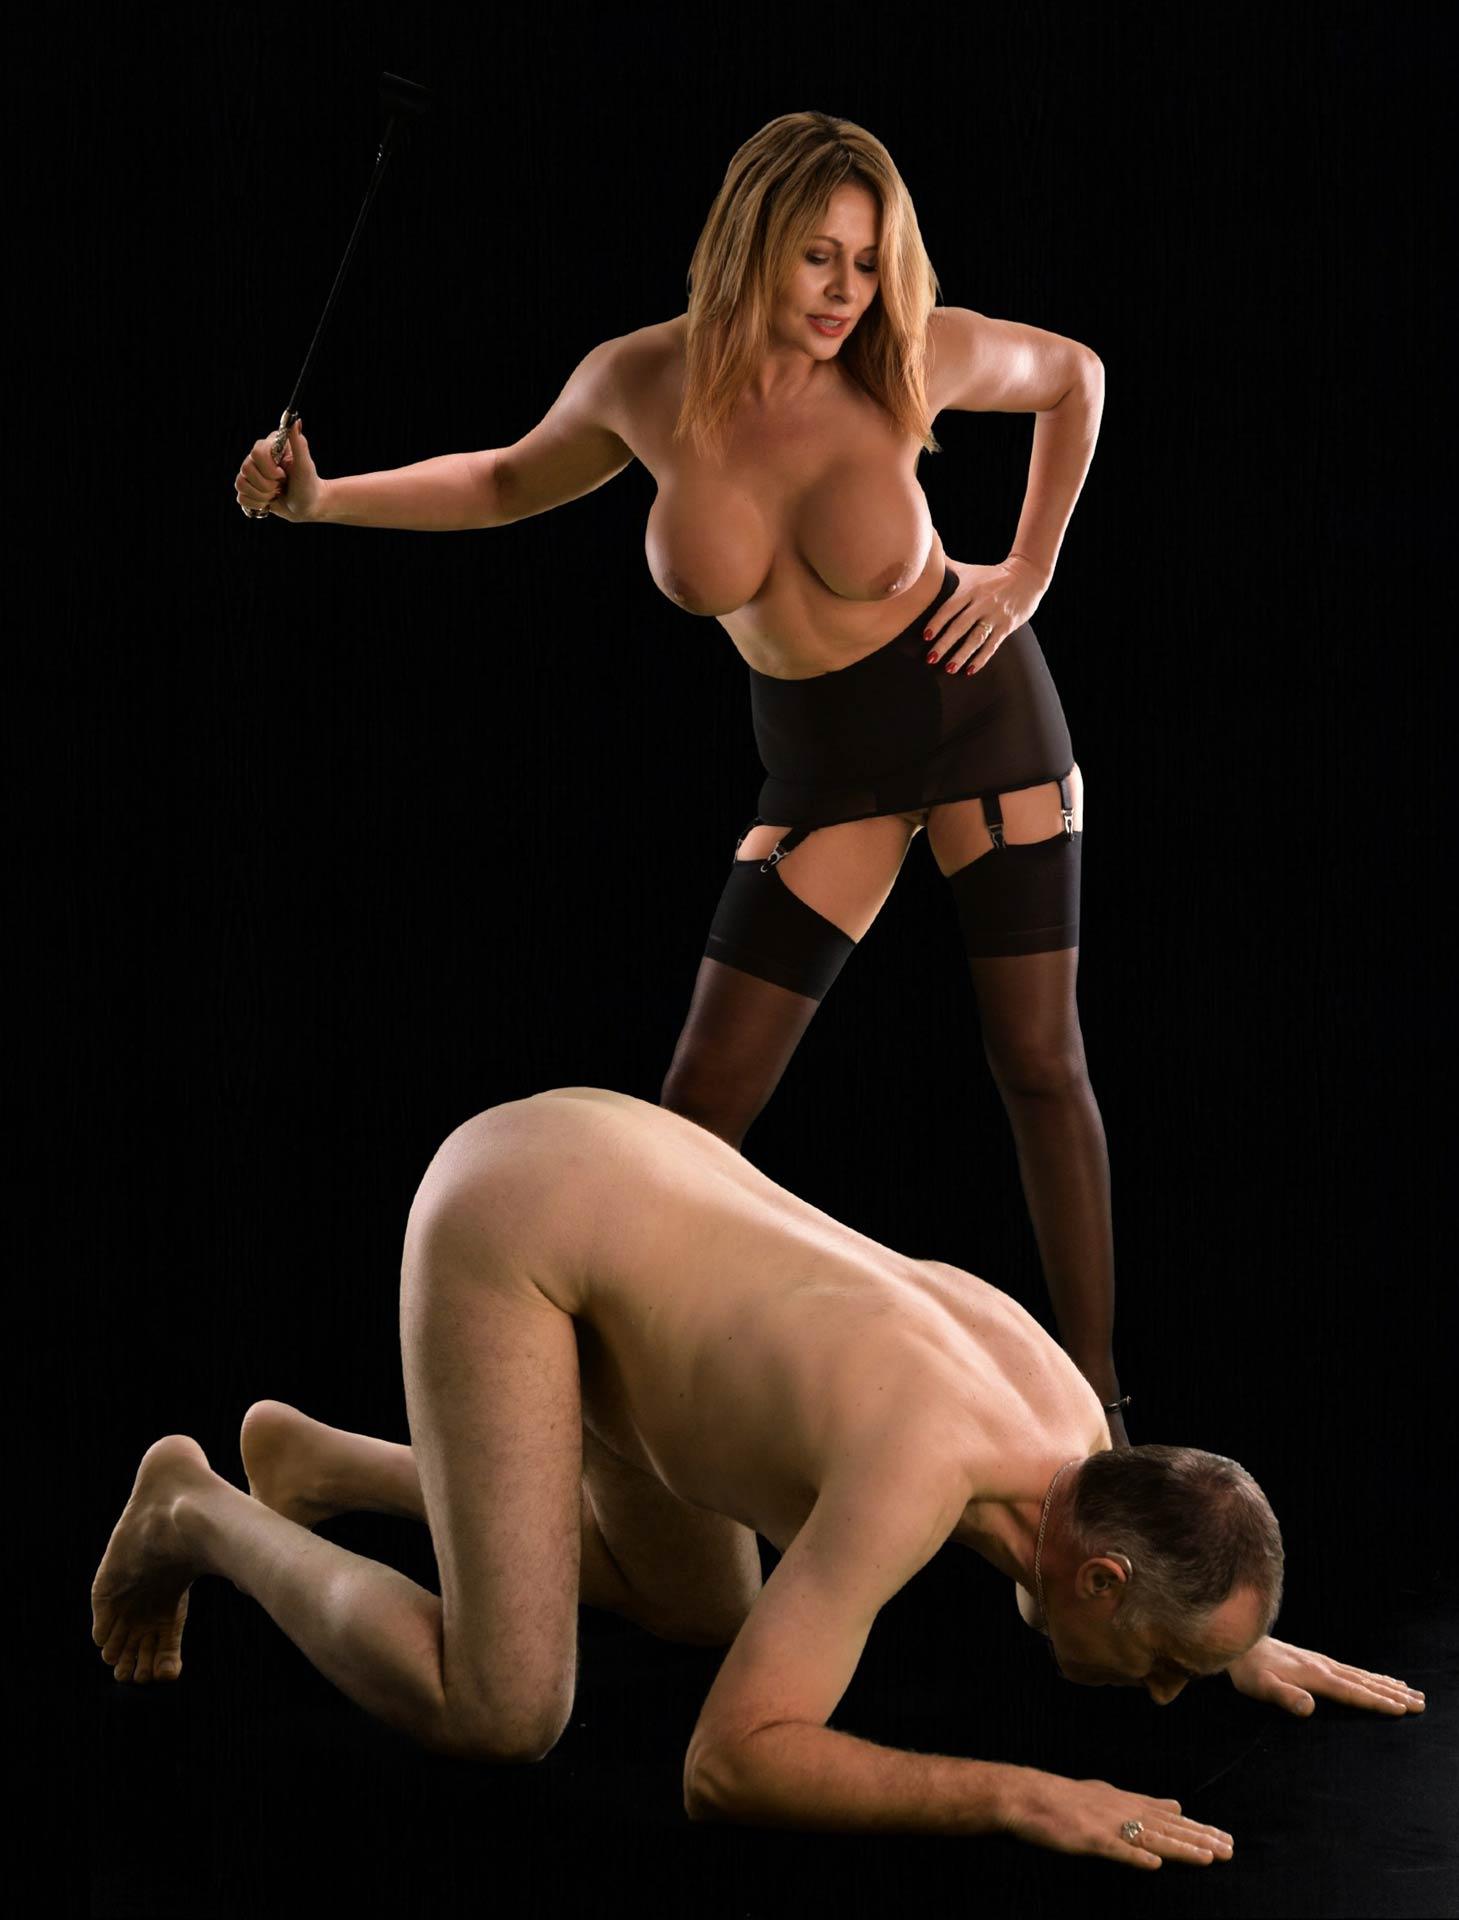 Caning with Mistress Carly | Ashford, Kent UK | Dominatrix and Mistress